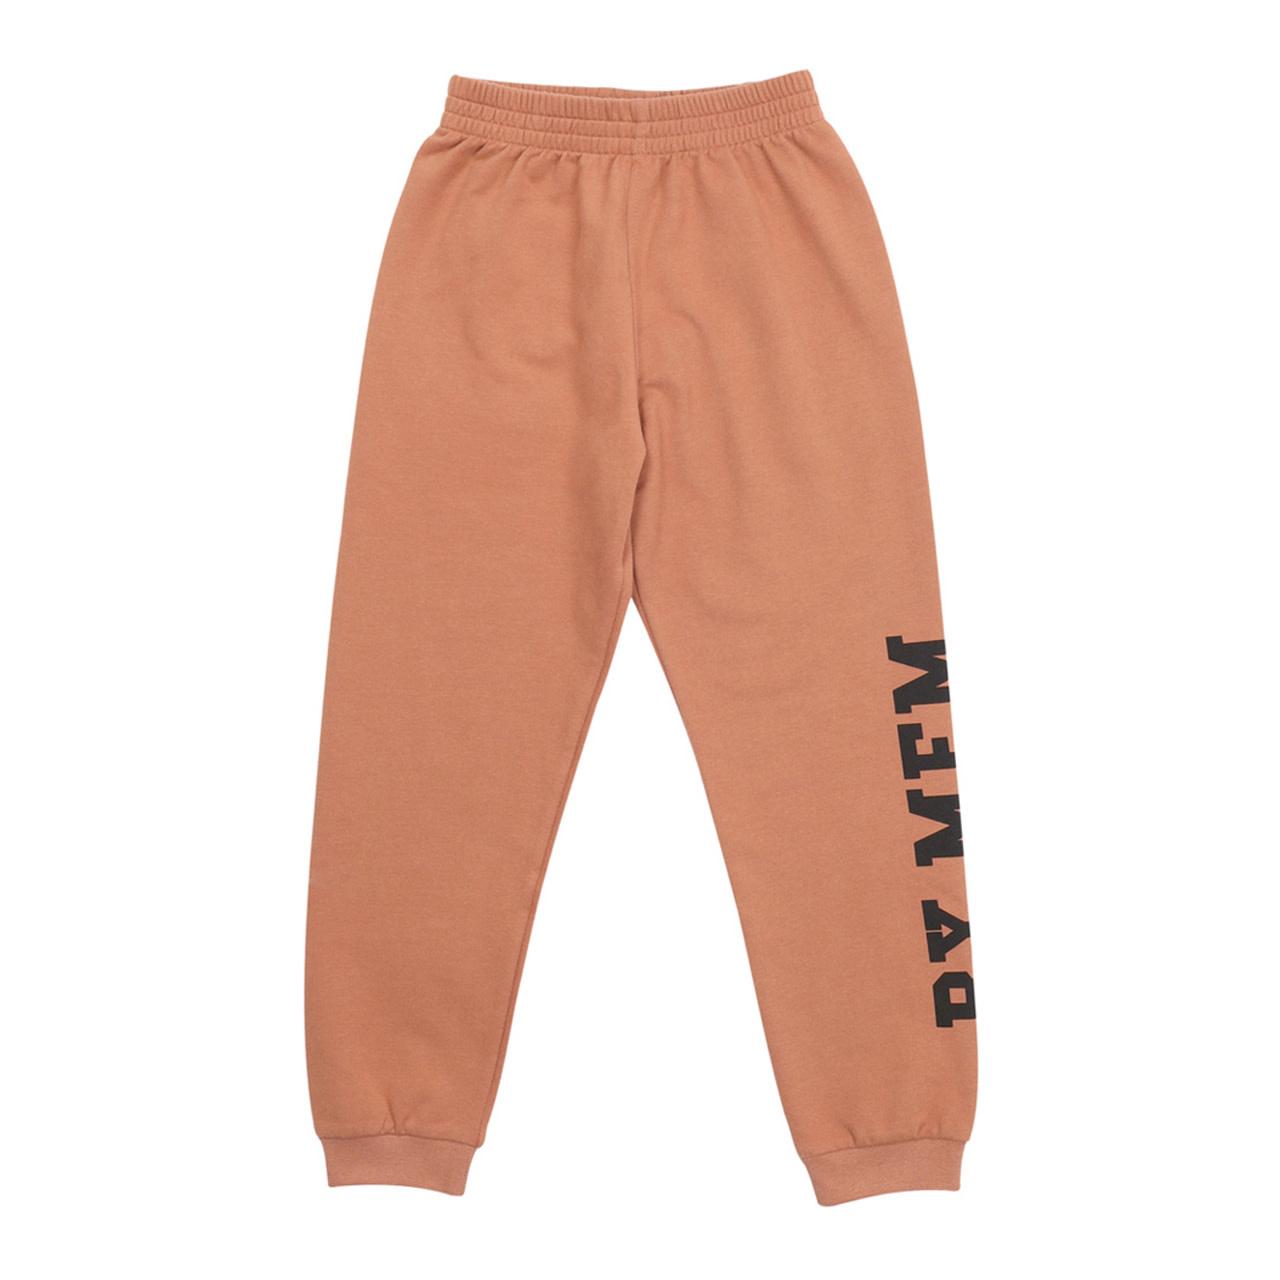 Jogging pants dirty dingo-2